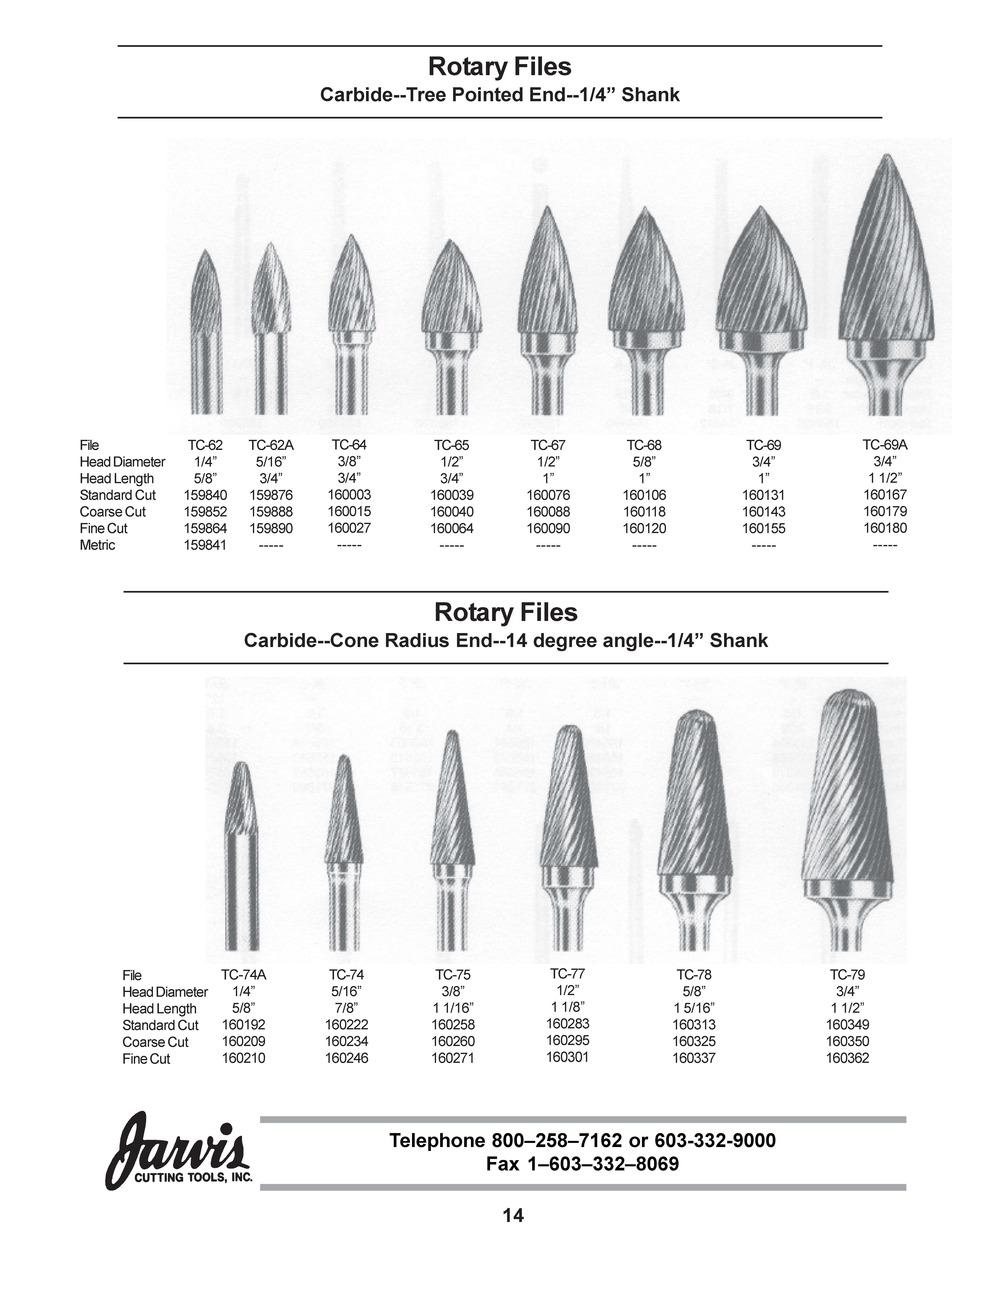 Rotary-Files-Catalog_Page_14.jpg